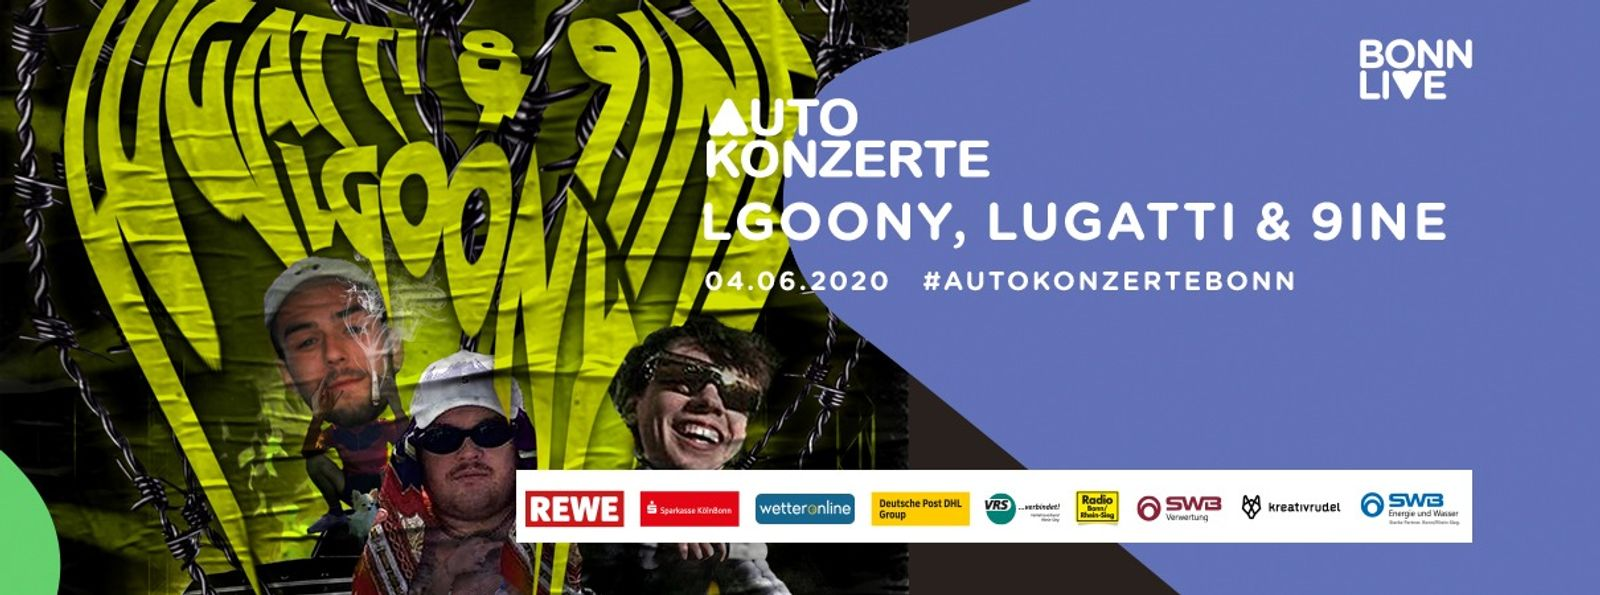 LGoony, Lugatti & 9ine   BonnLive Autokonzerte